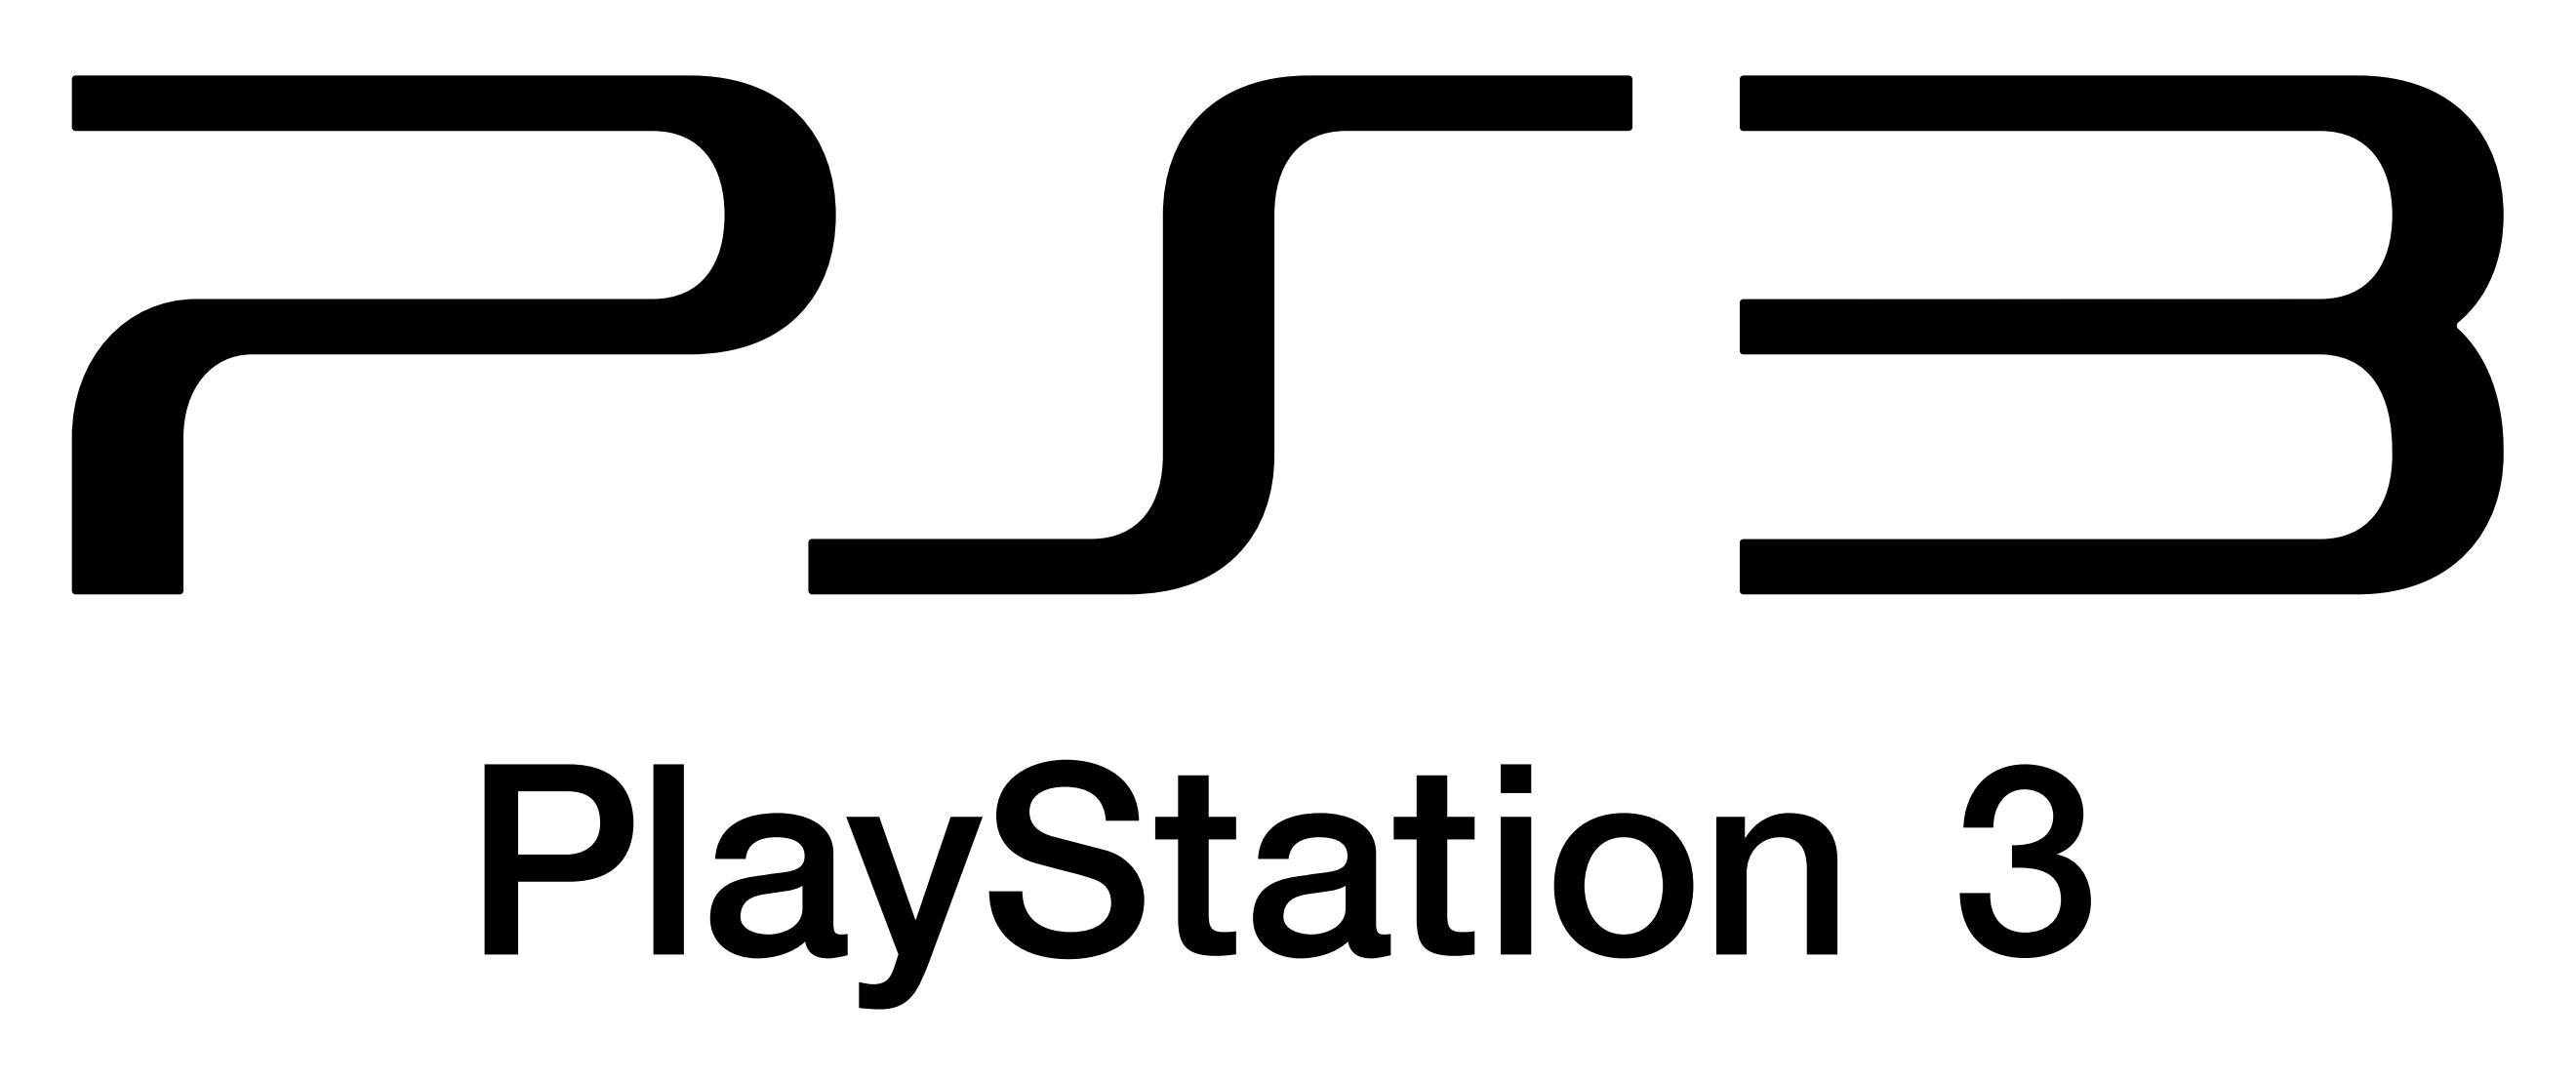 Ps3 Playstation 3 Logo Vector Eps File Vector Eps Free